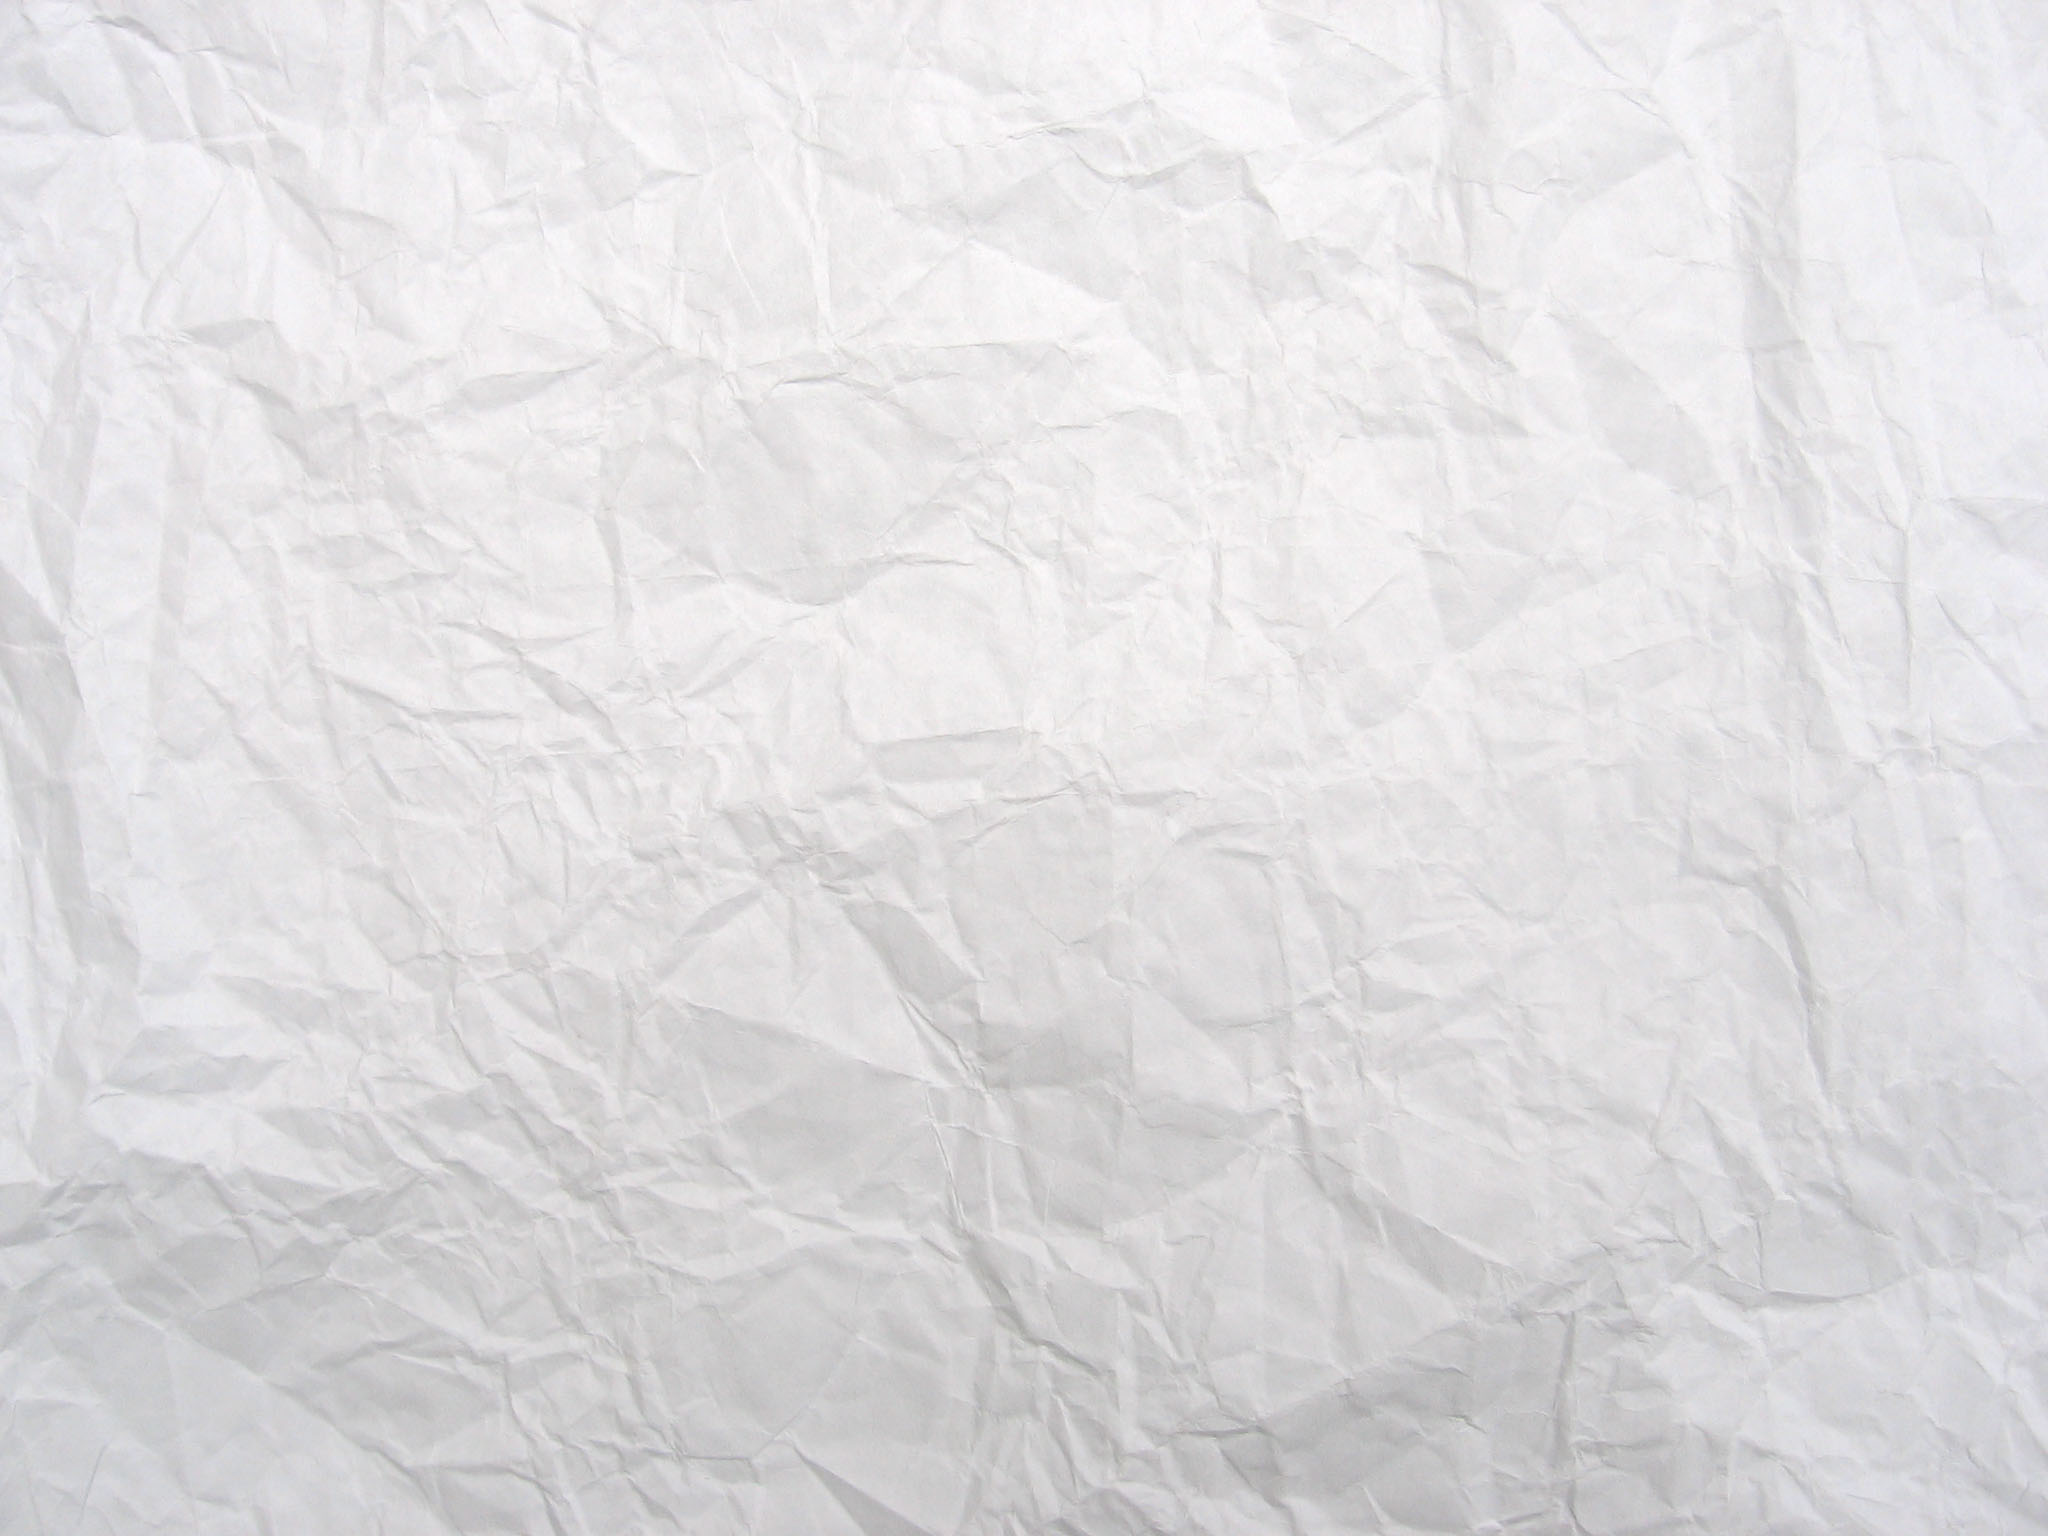 Download Crumpled White Paper Texture Melemel Jpeg Wallpaper 2048x1536 2048x1536